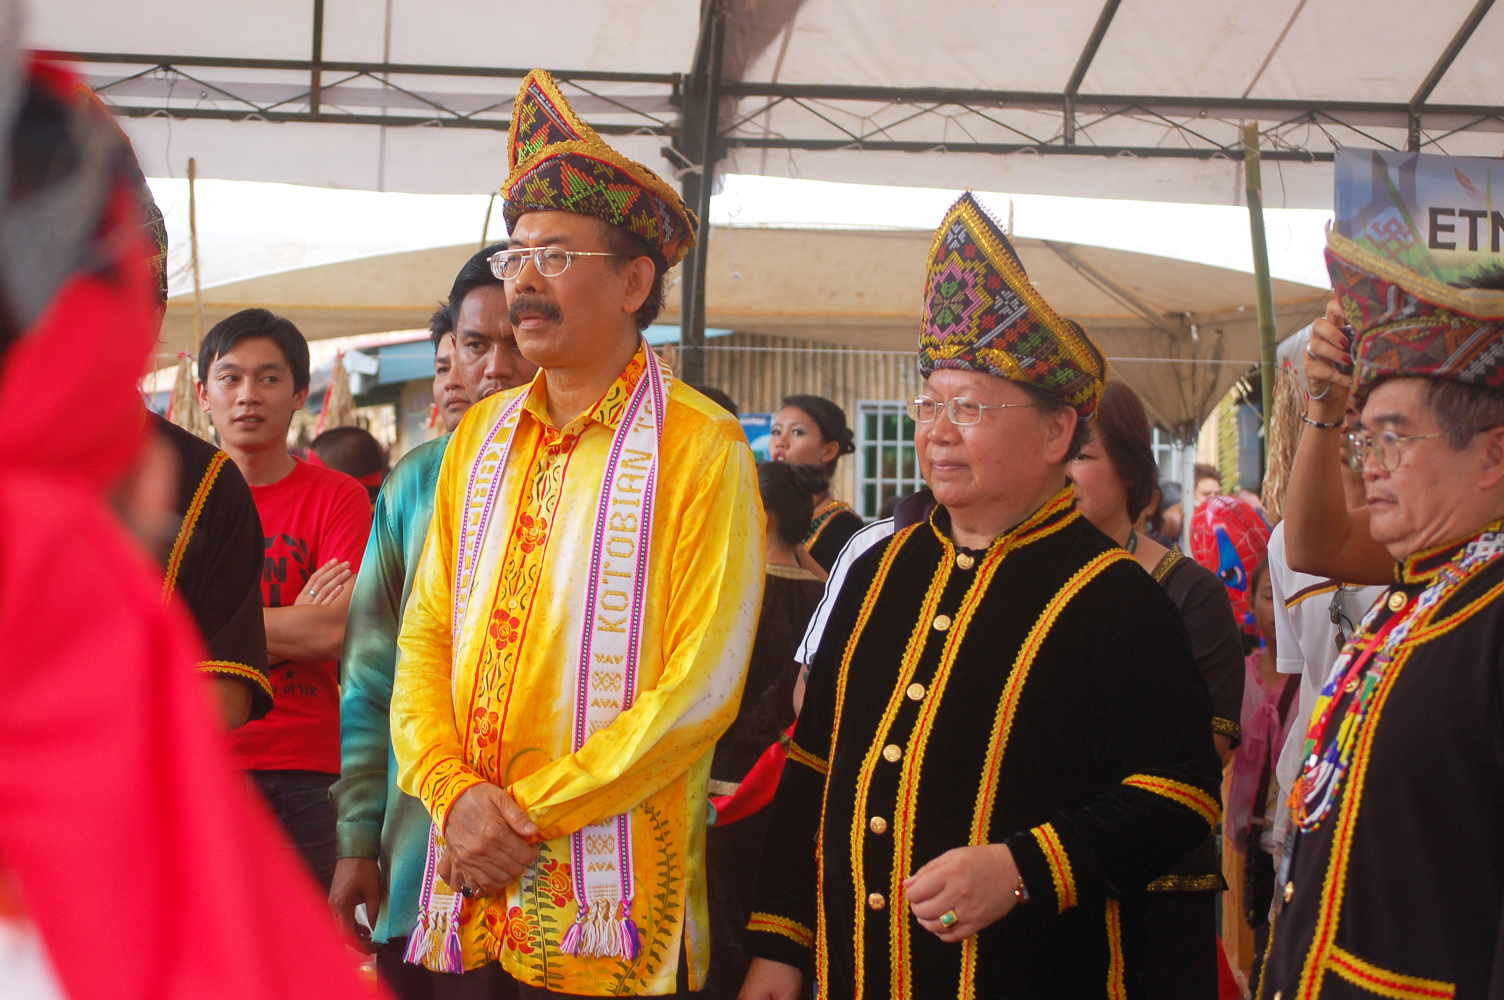 Natives Kadazan-Dusun-Murut 'goddess' for the Grand Final Harvest